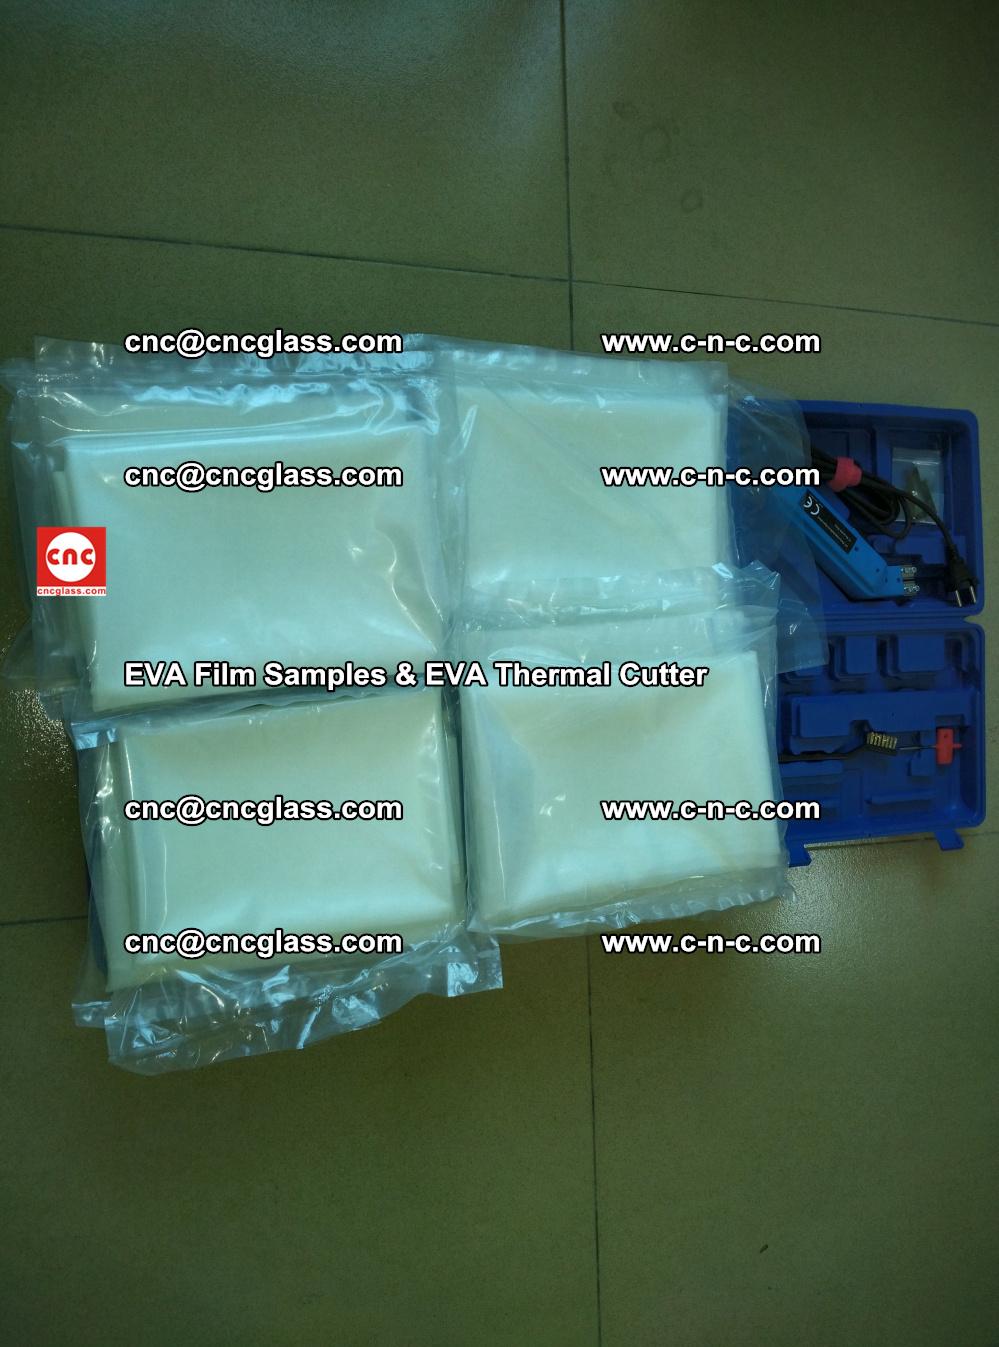 EVAFORCE SUPER CLEAR EVA Film Samples and EVA Thermal Cutter (41)